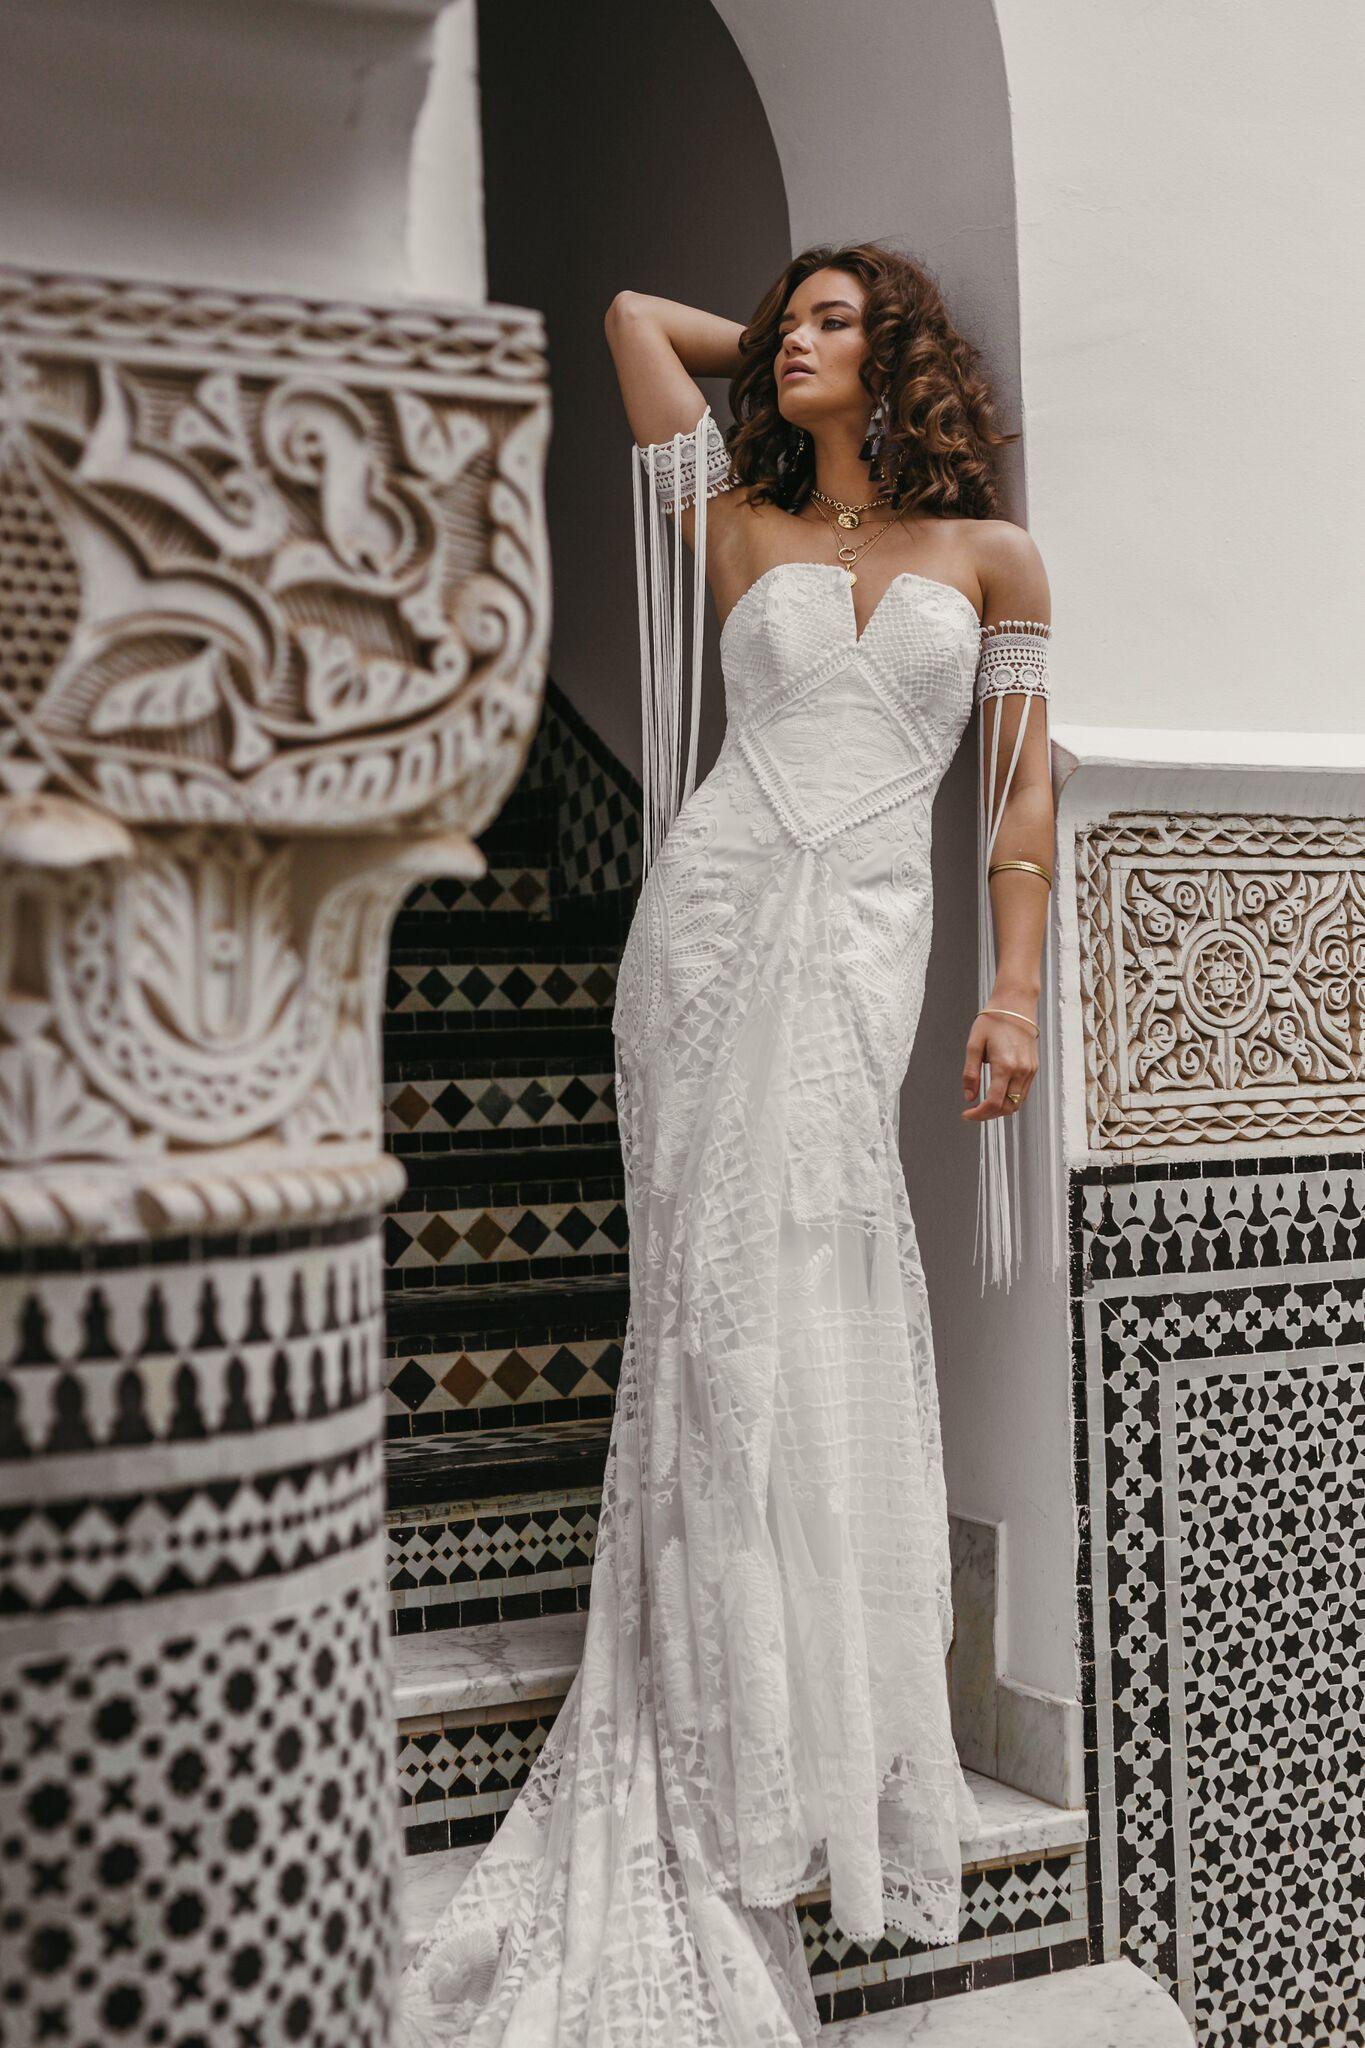 New rue de seine wedding dresses trunk shows beach wedding